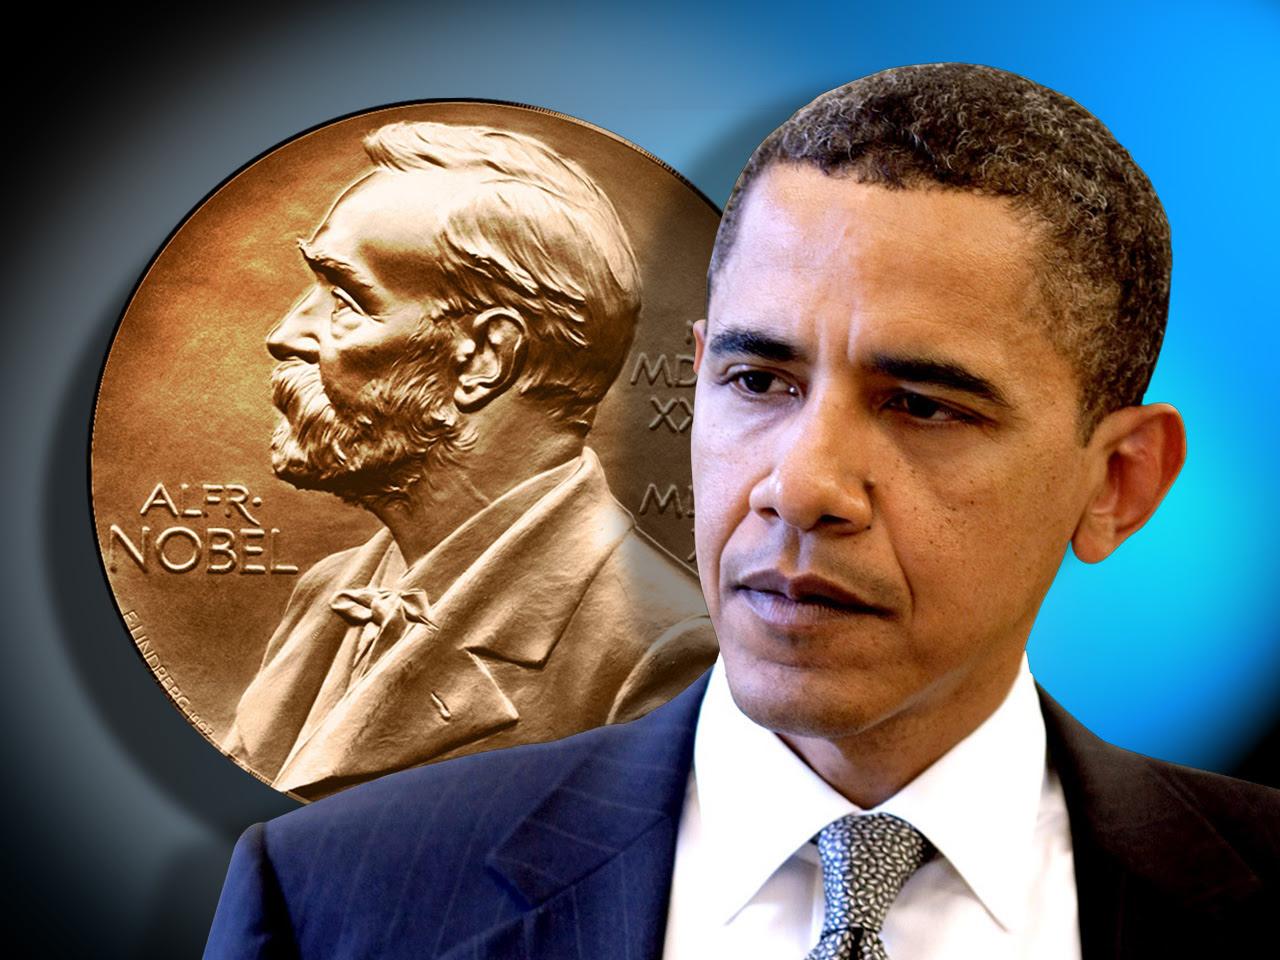 http://www.wbrz.com/images/news/obamanobel.jpg